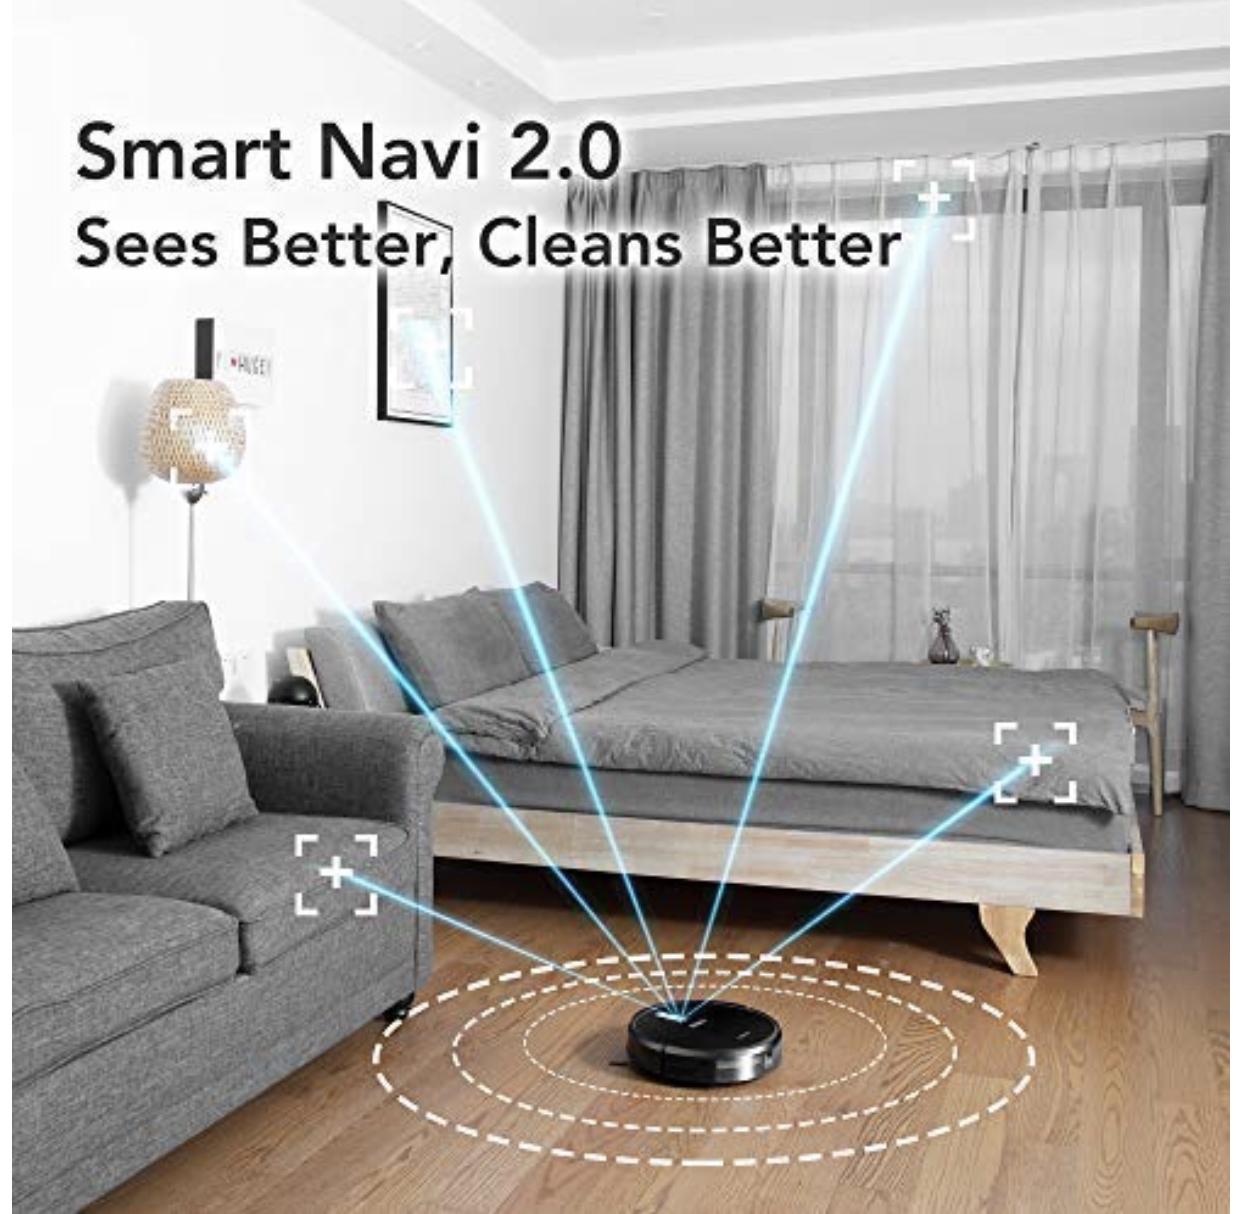 ECOVACS DEEBOT 711 Robot Vacuum Cleaner with Smart Navi 2.0 $329.99 @ Amazon